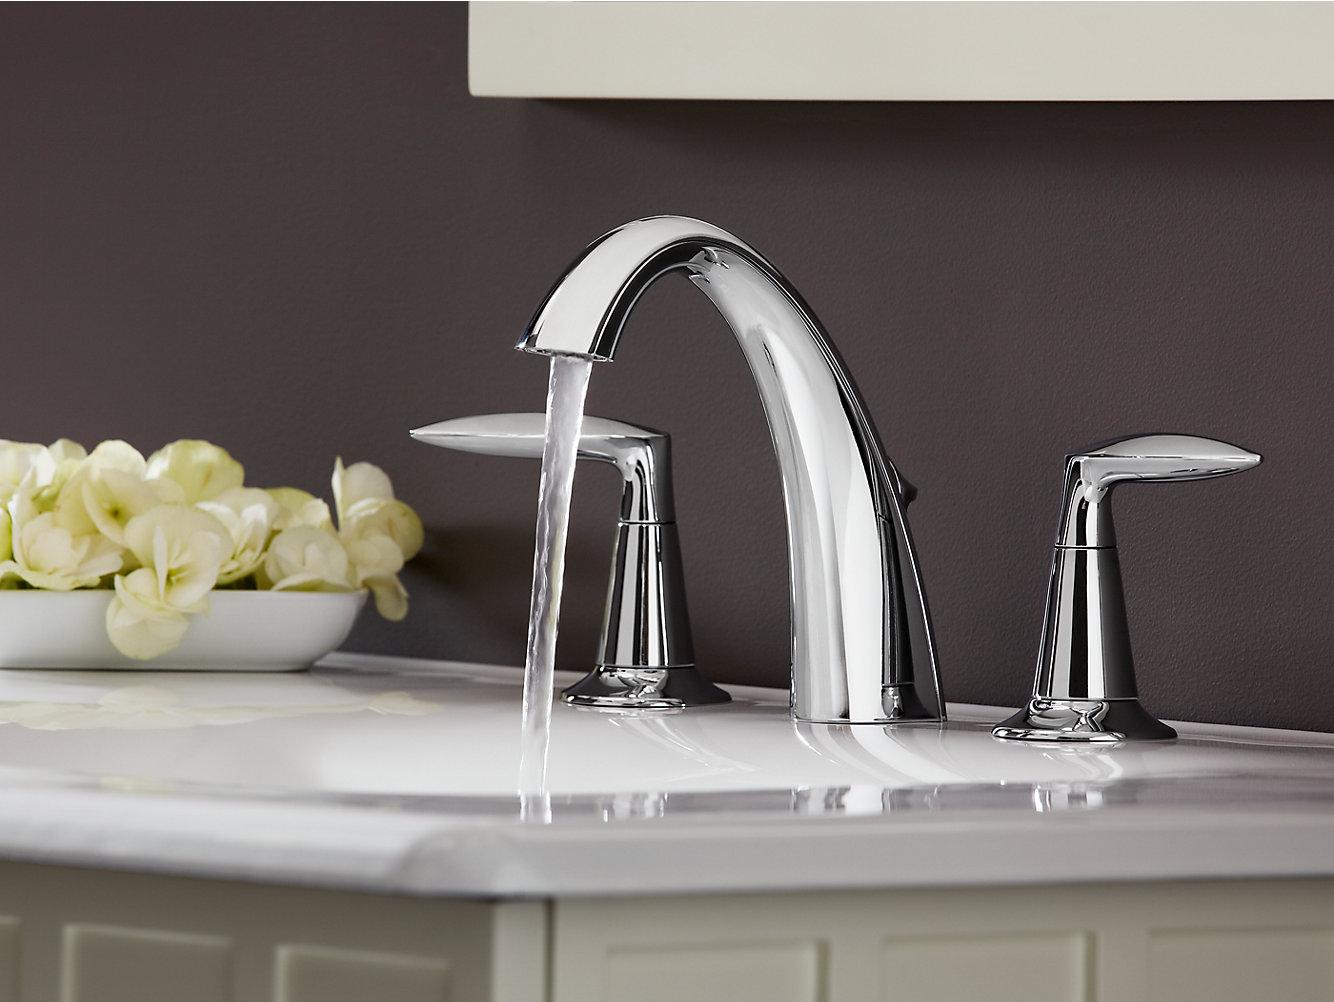 KOHLER | 45102-4 | Alteo widespread bathroom sink faucet with lever ...